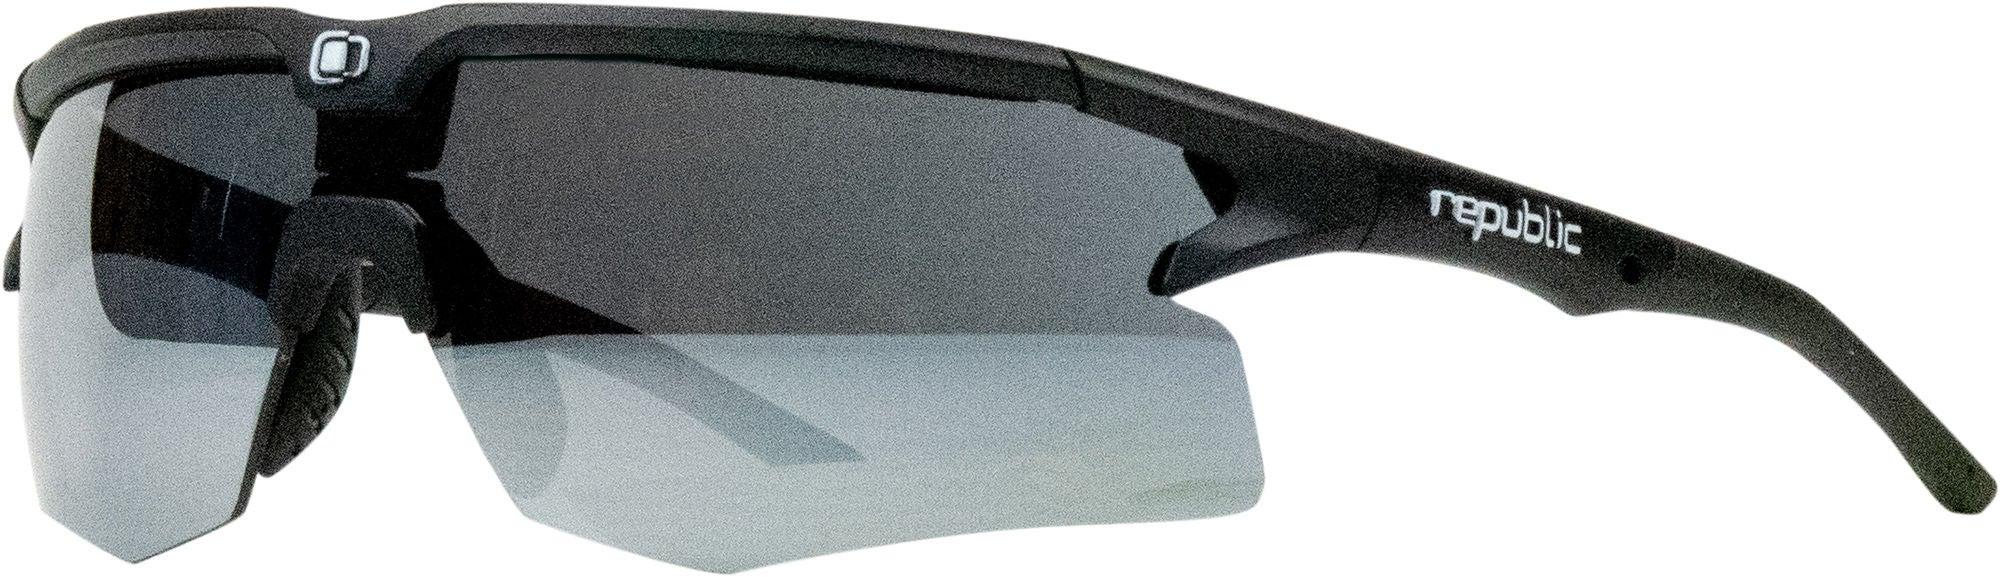 Republic Sportglasögon R110, Svart S